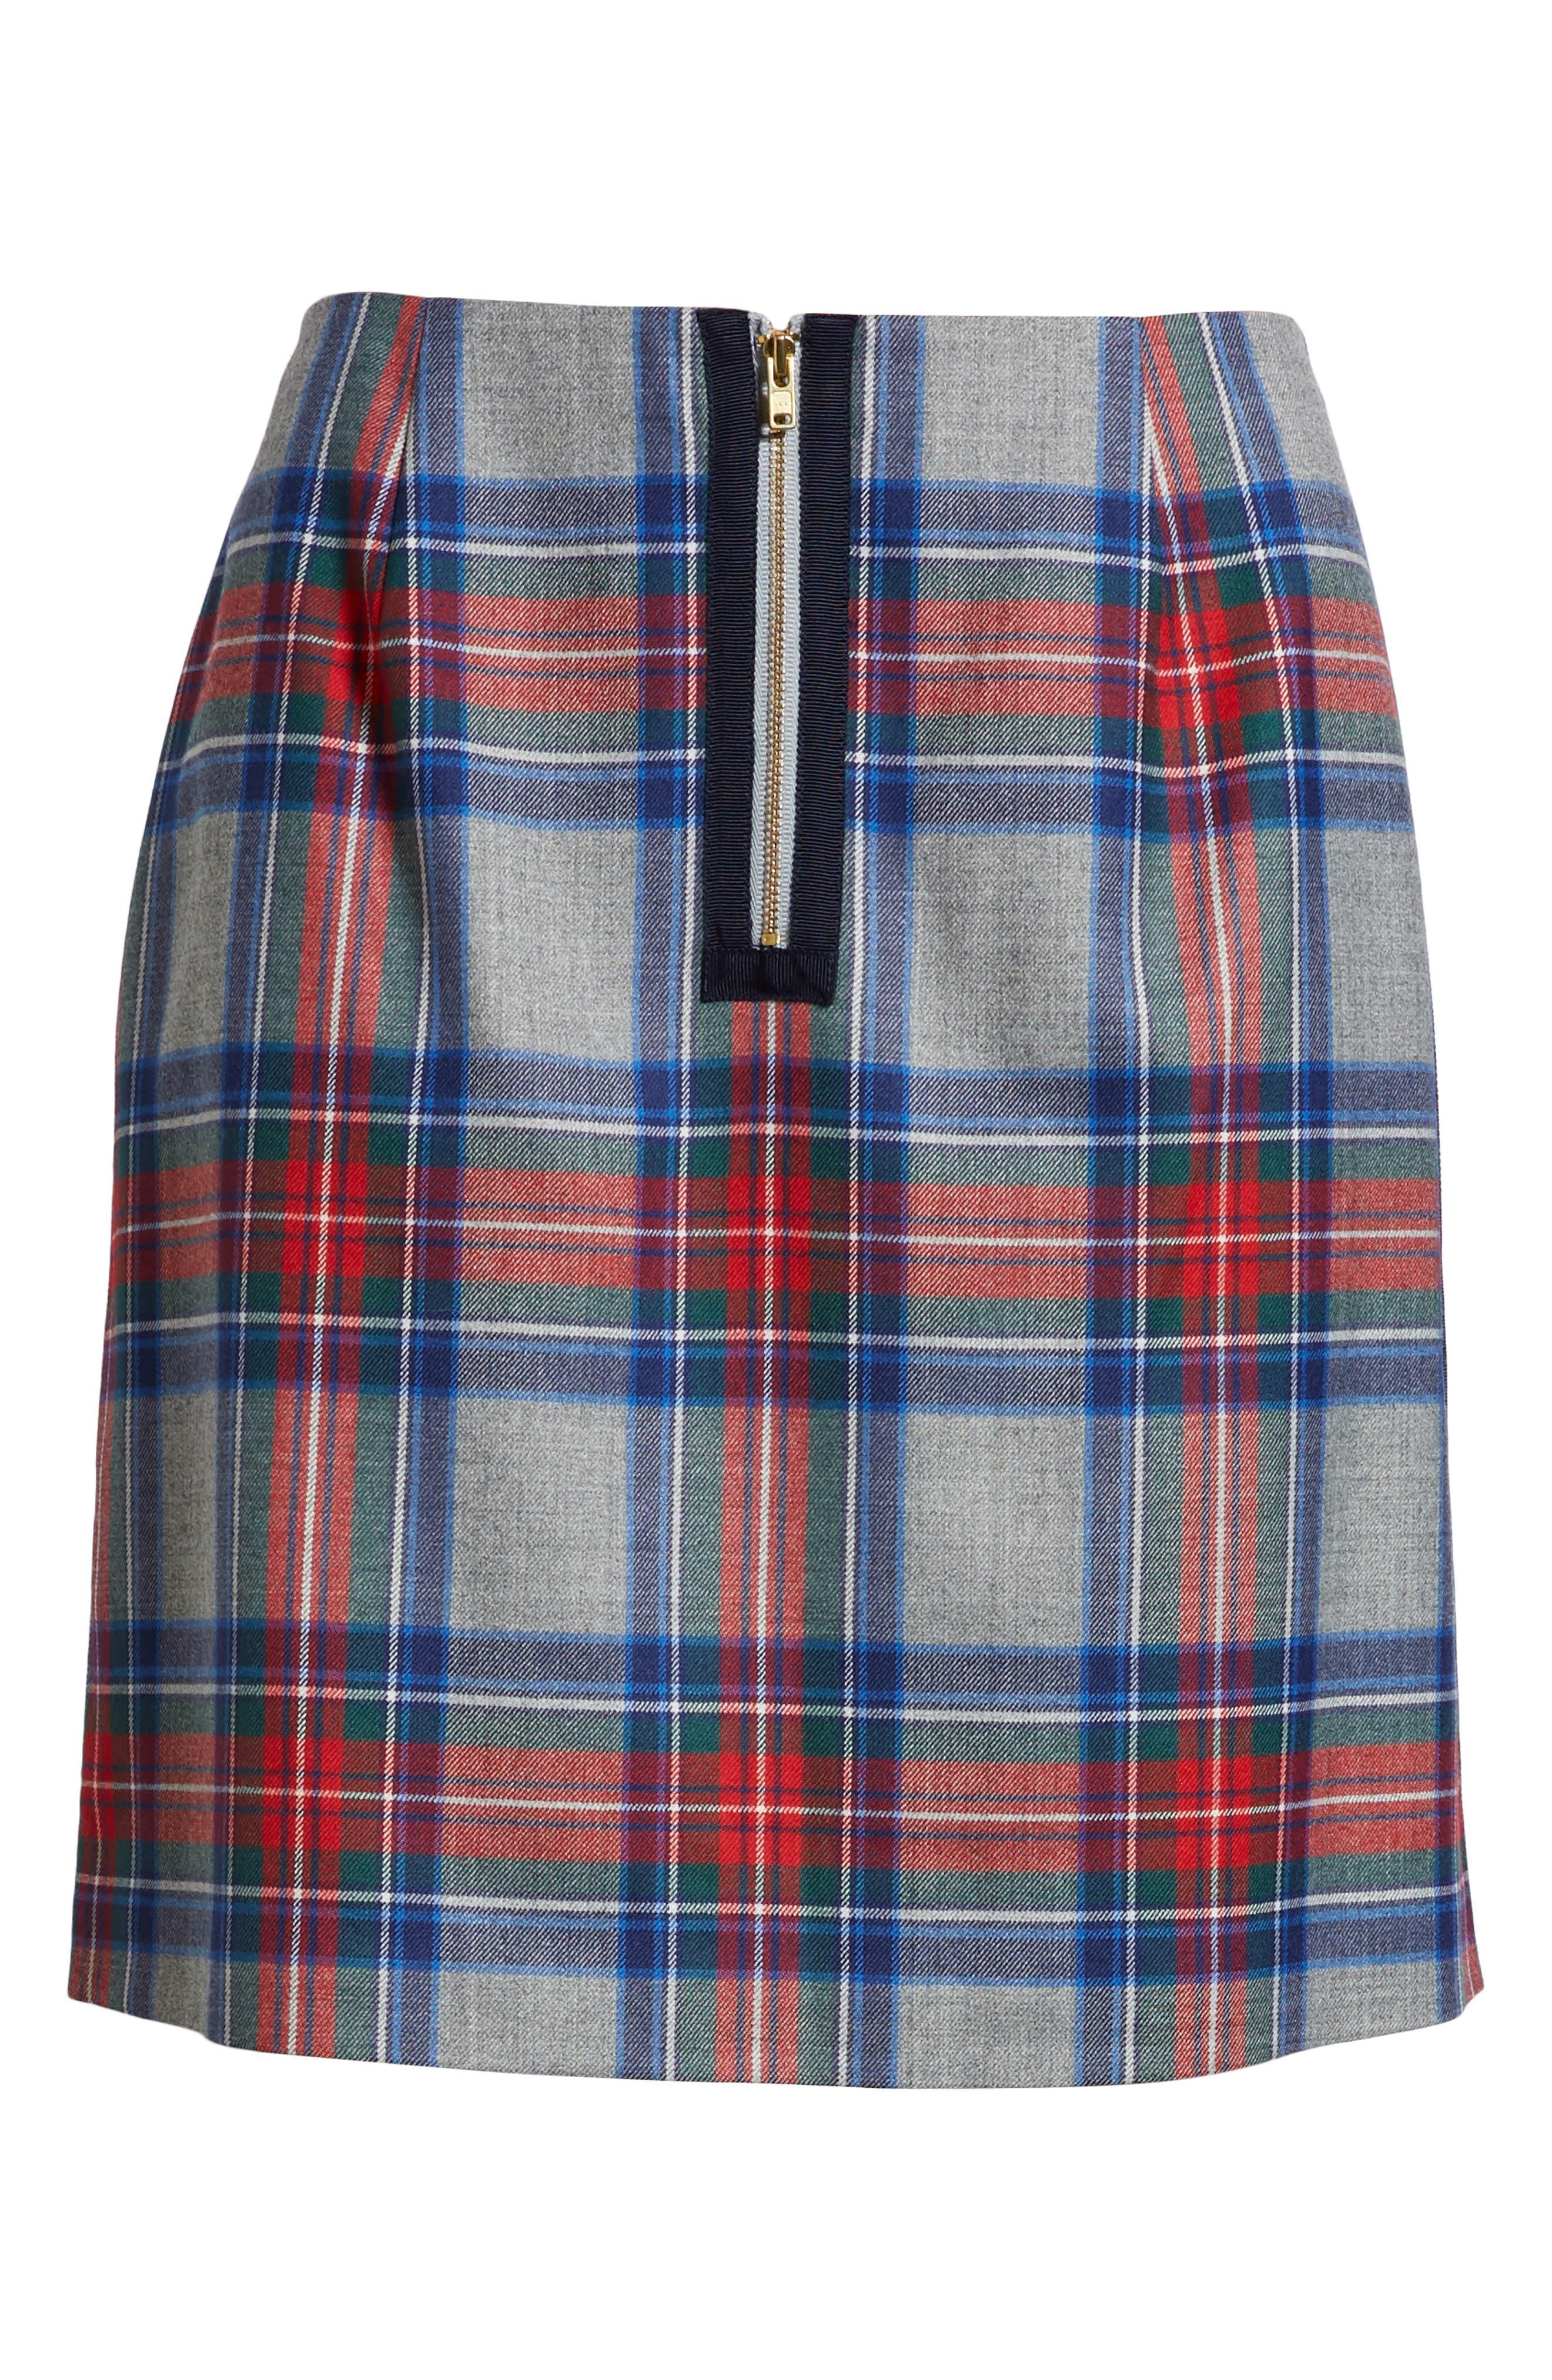 Jolly Plaid Miniskirt,                             Alternate thumbnail 6, color,                             GRAY HEATHER